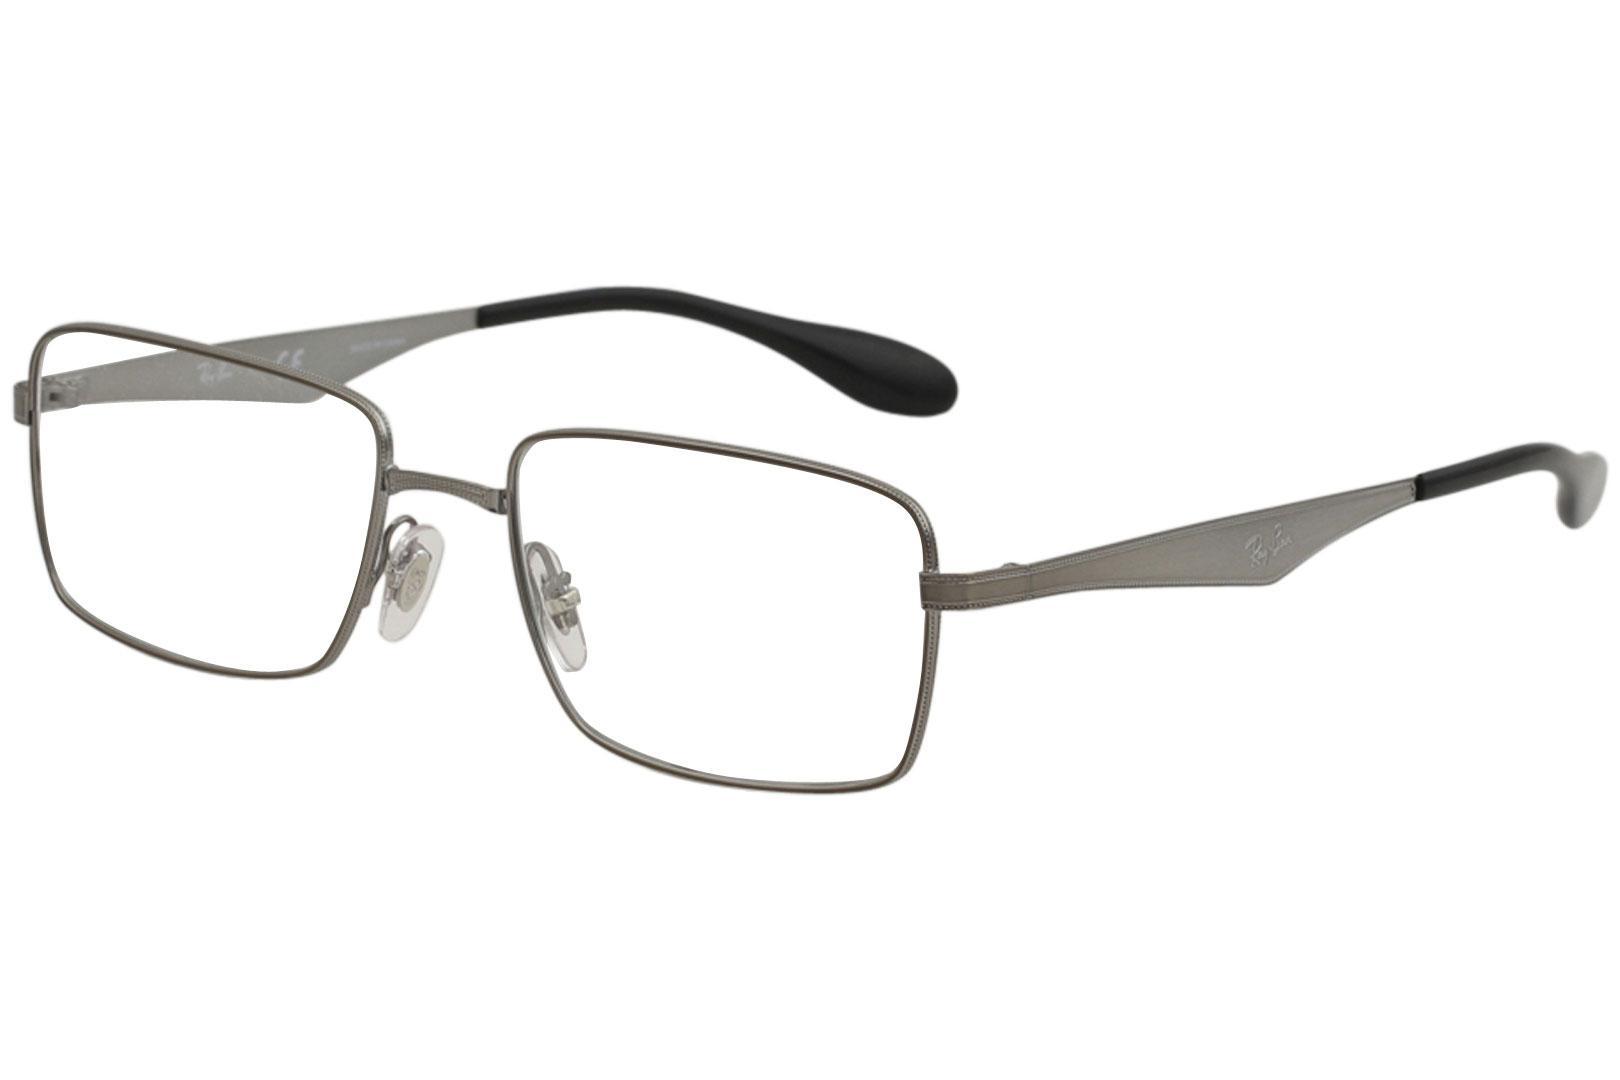 37c24221d673 Ray Ban Men s Eyeglasses RX6329 RX 6329 RayBan Full Rim Optical Frame by Ray  Ban. 12345